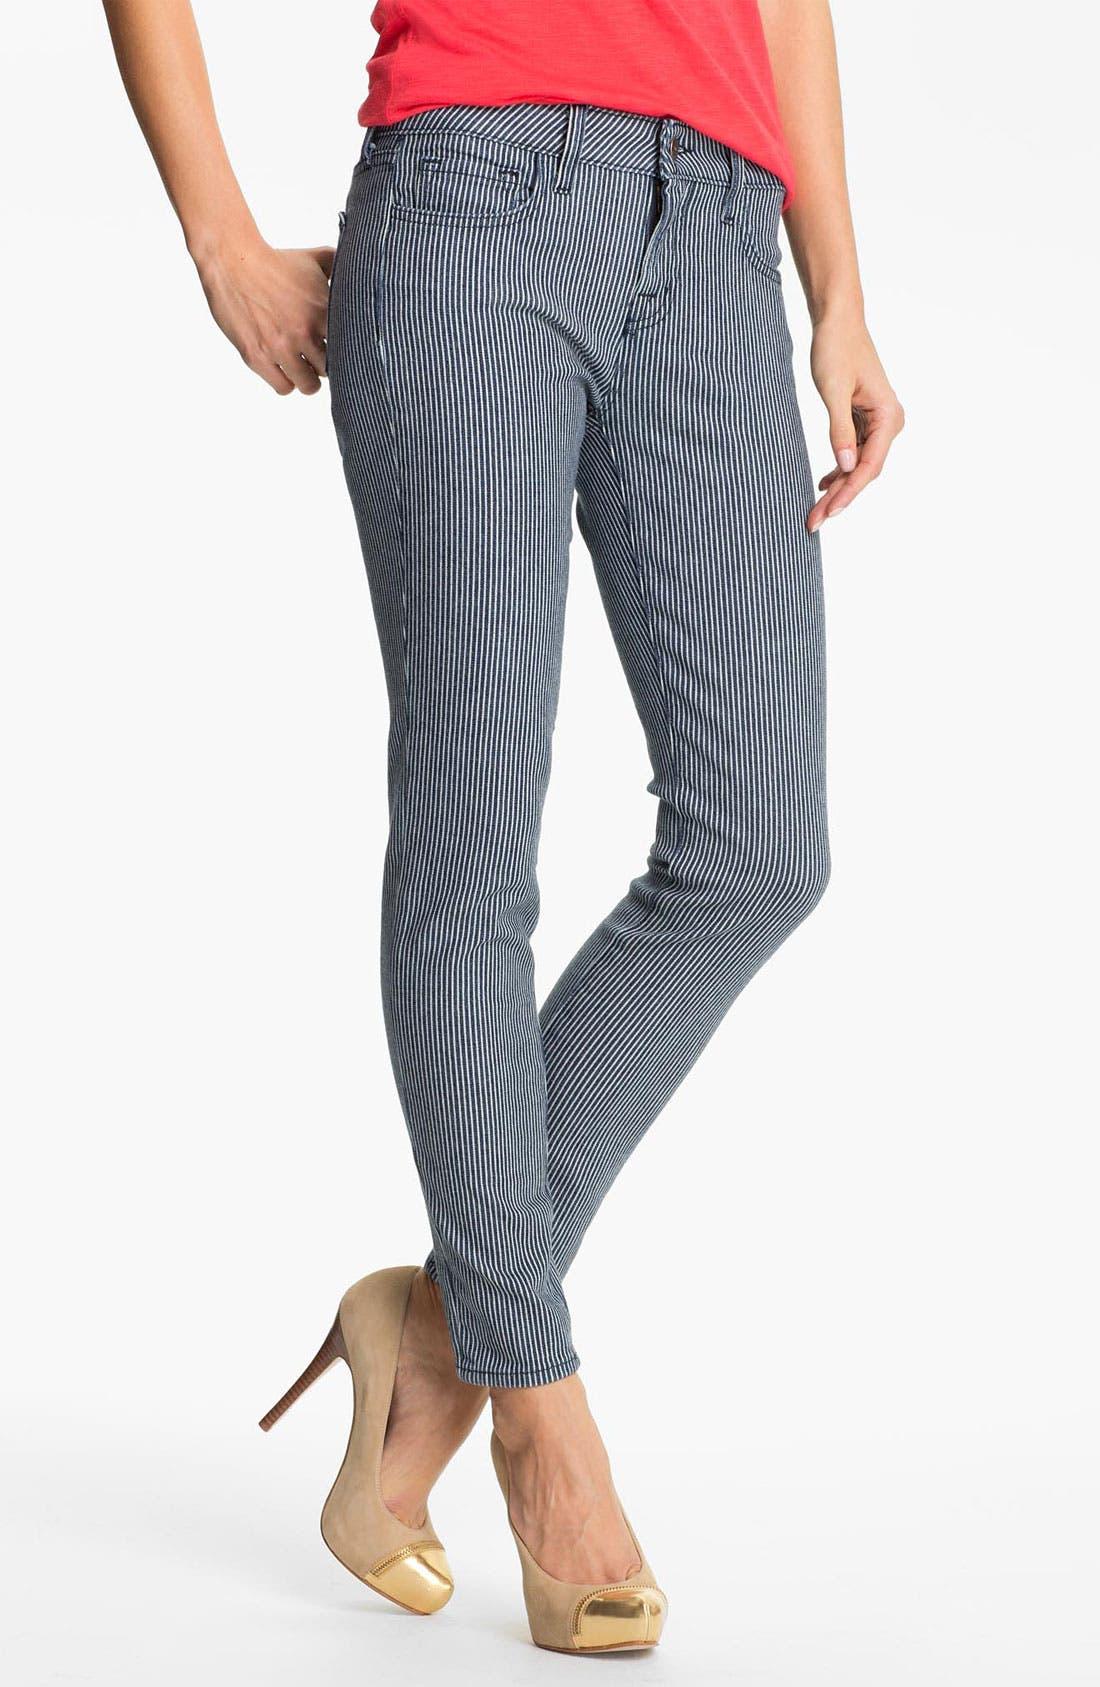 Alternate Image 1 Selected - Blue Essence Railroad Stripe Skinny Jeans (Nordstrom Exclusive)